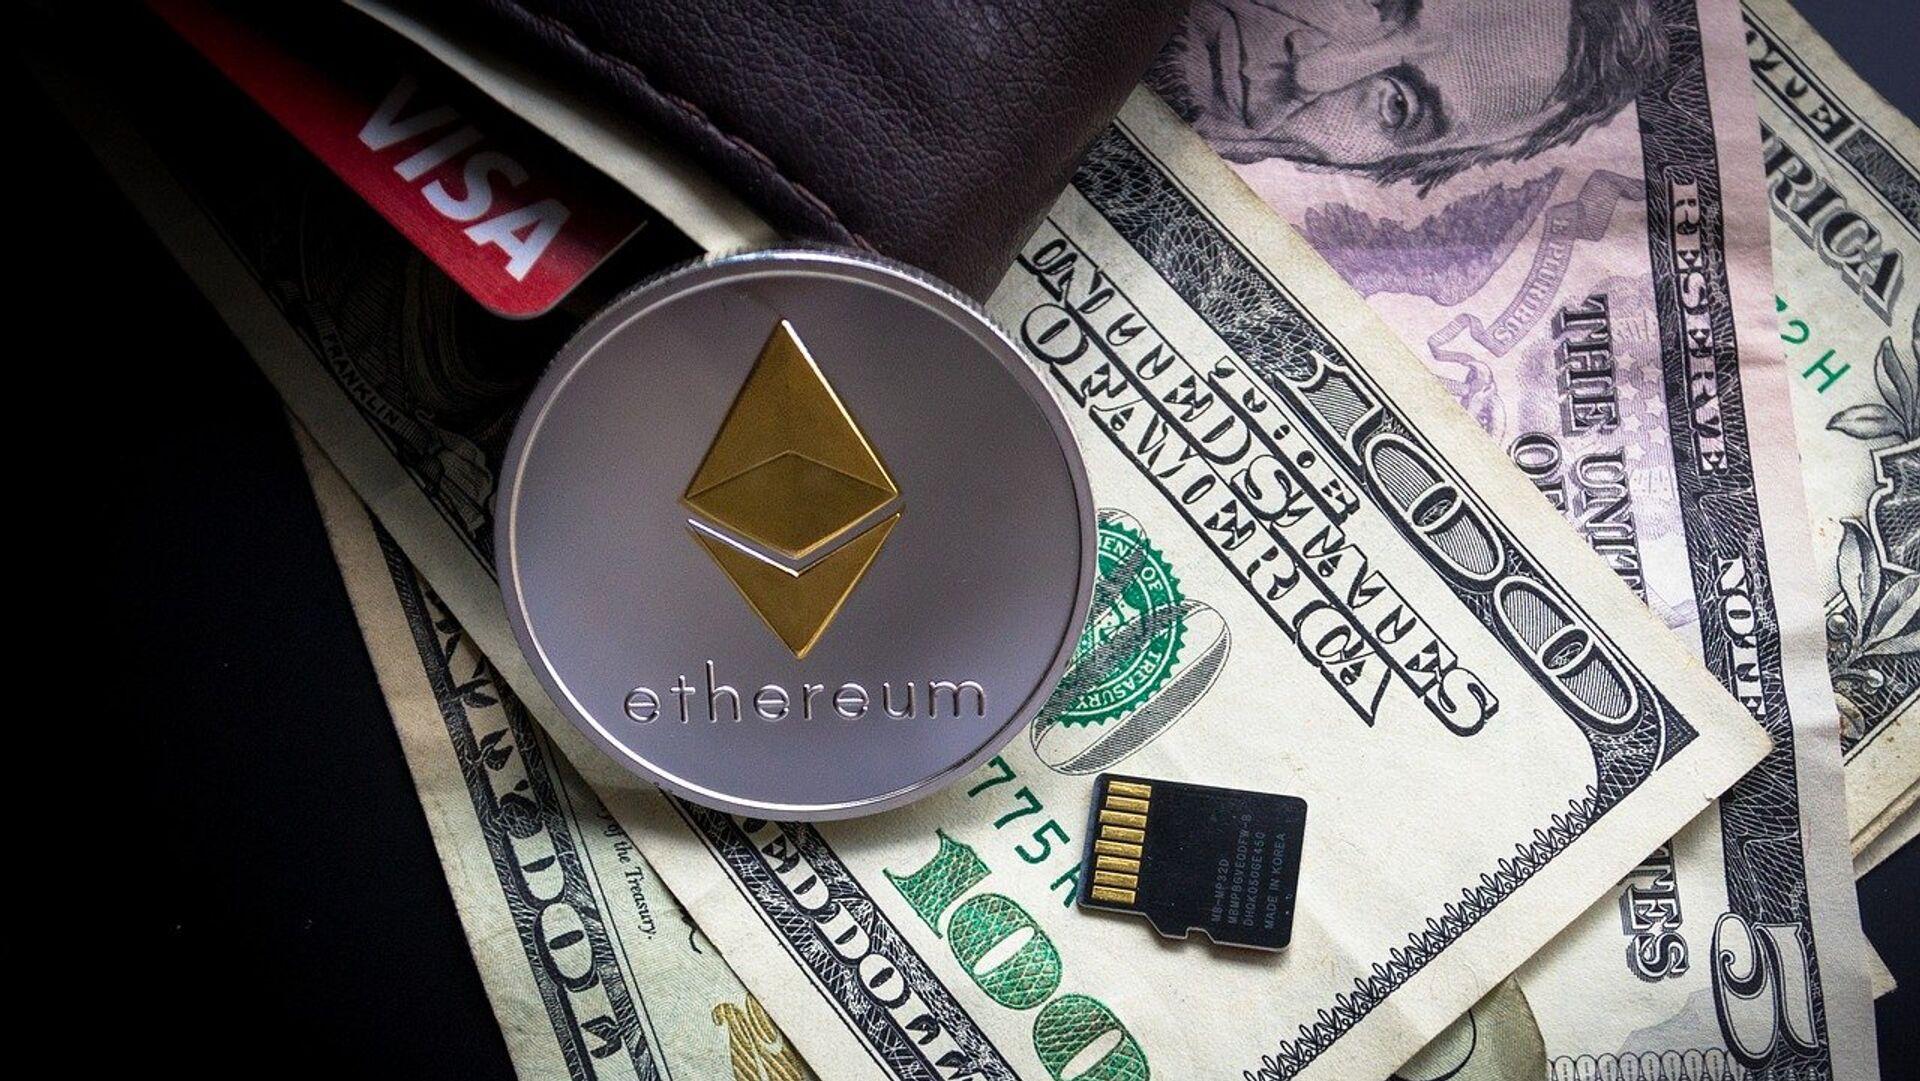 Ethereum, moneda criptográfica, y billetes de dólares estadounidenses - Sputnik Mundo, 1920, 29.09.2021